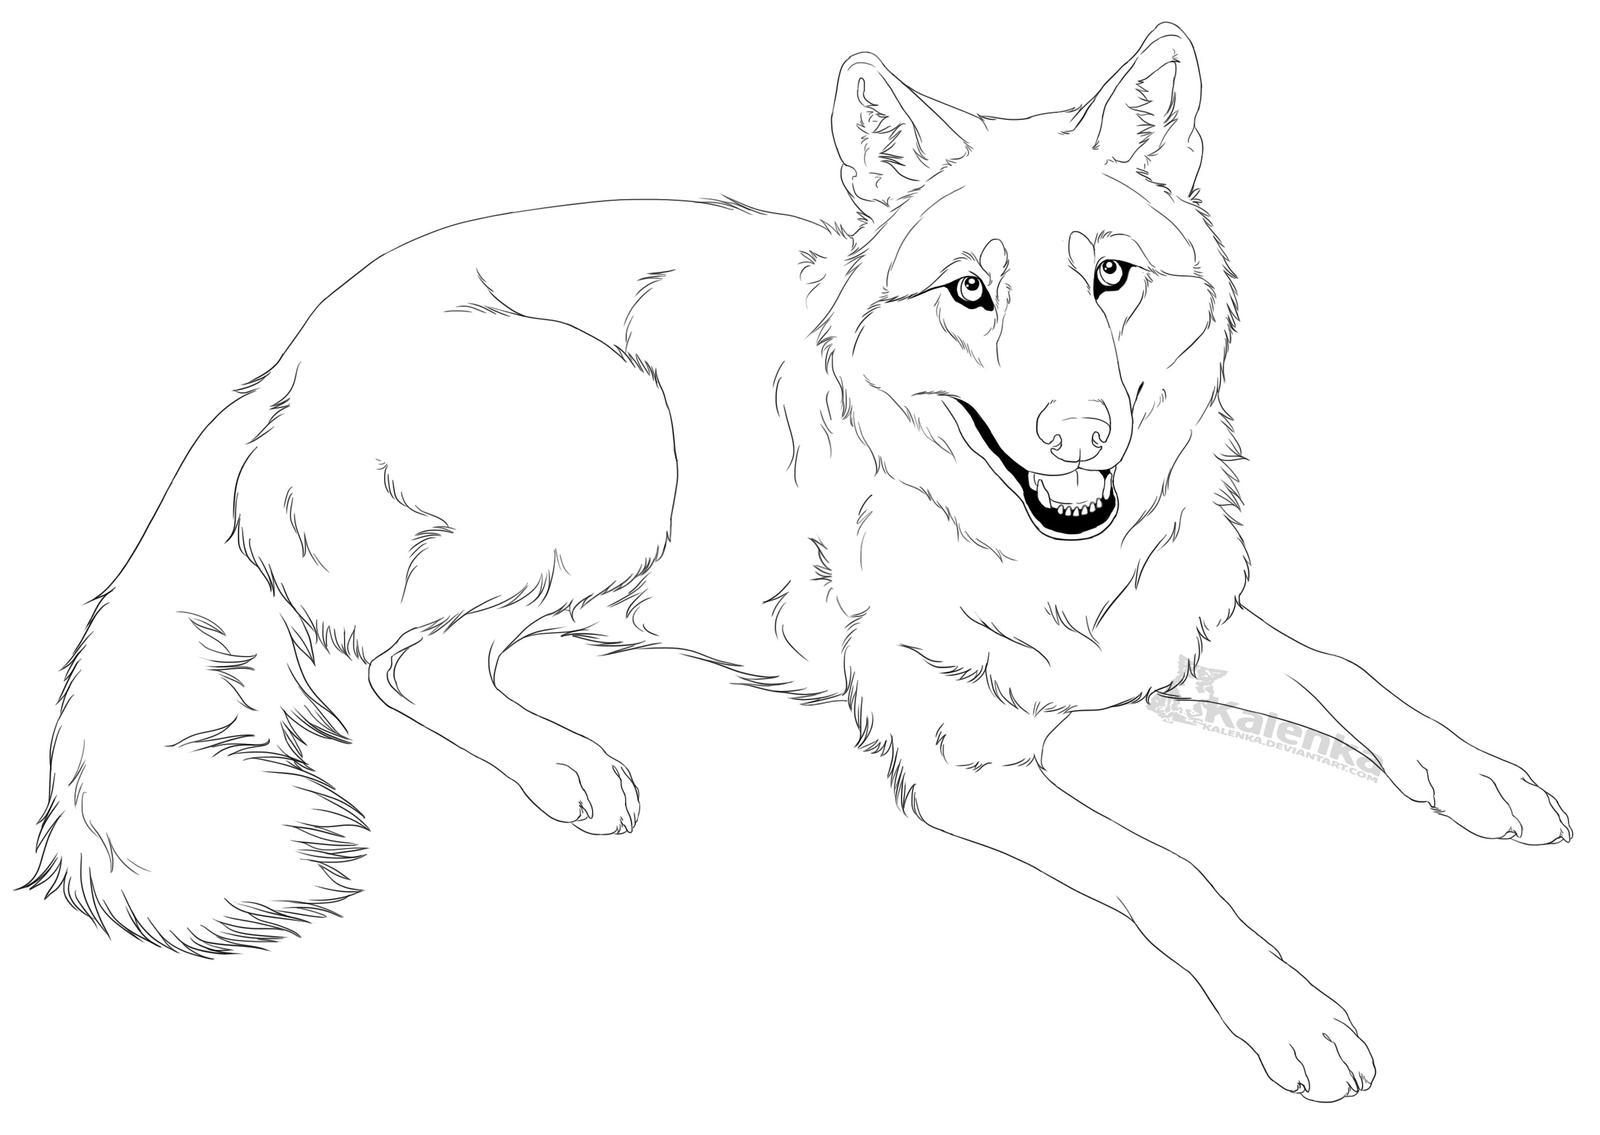 Line Drawing Of A Dog : Good dog com by kalenka on deviantart